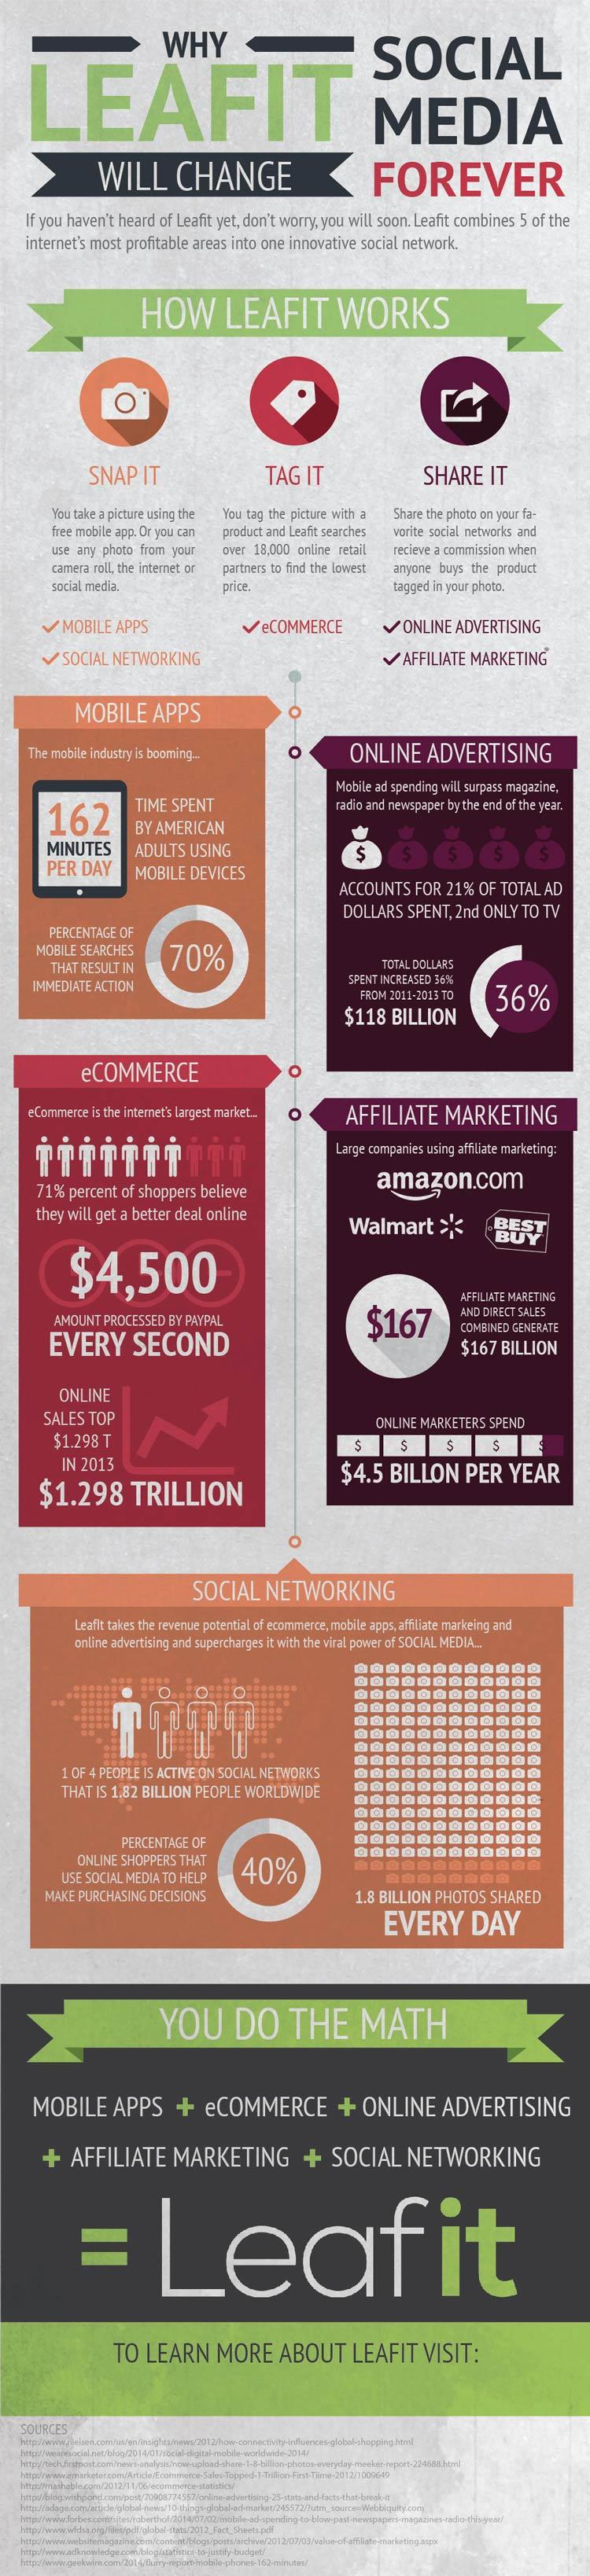 Leafit Infographic